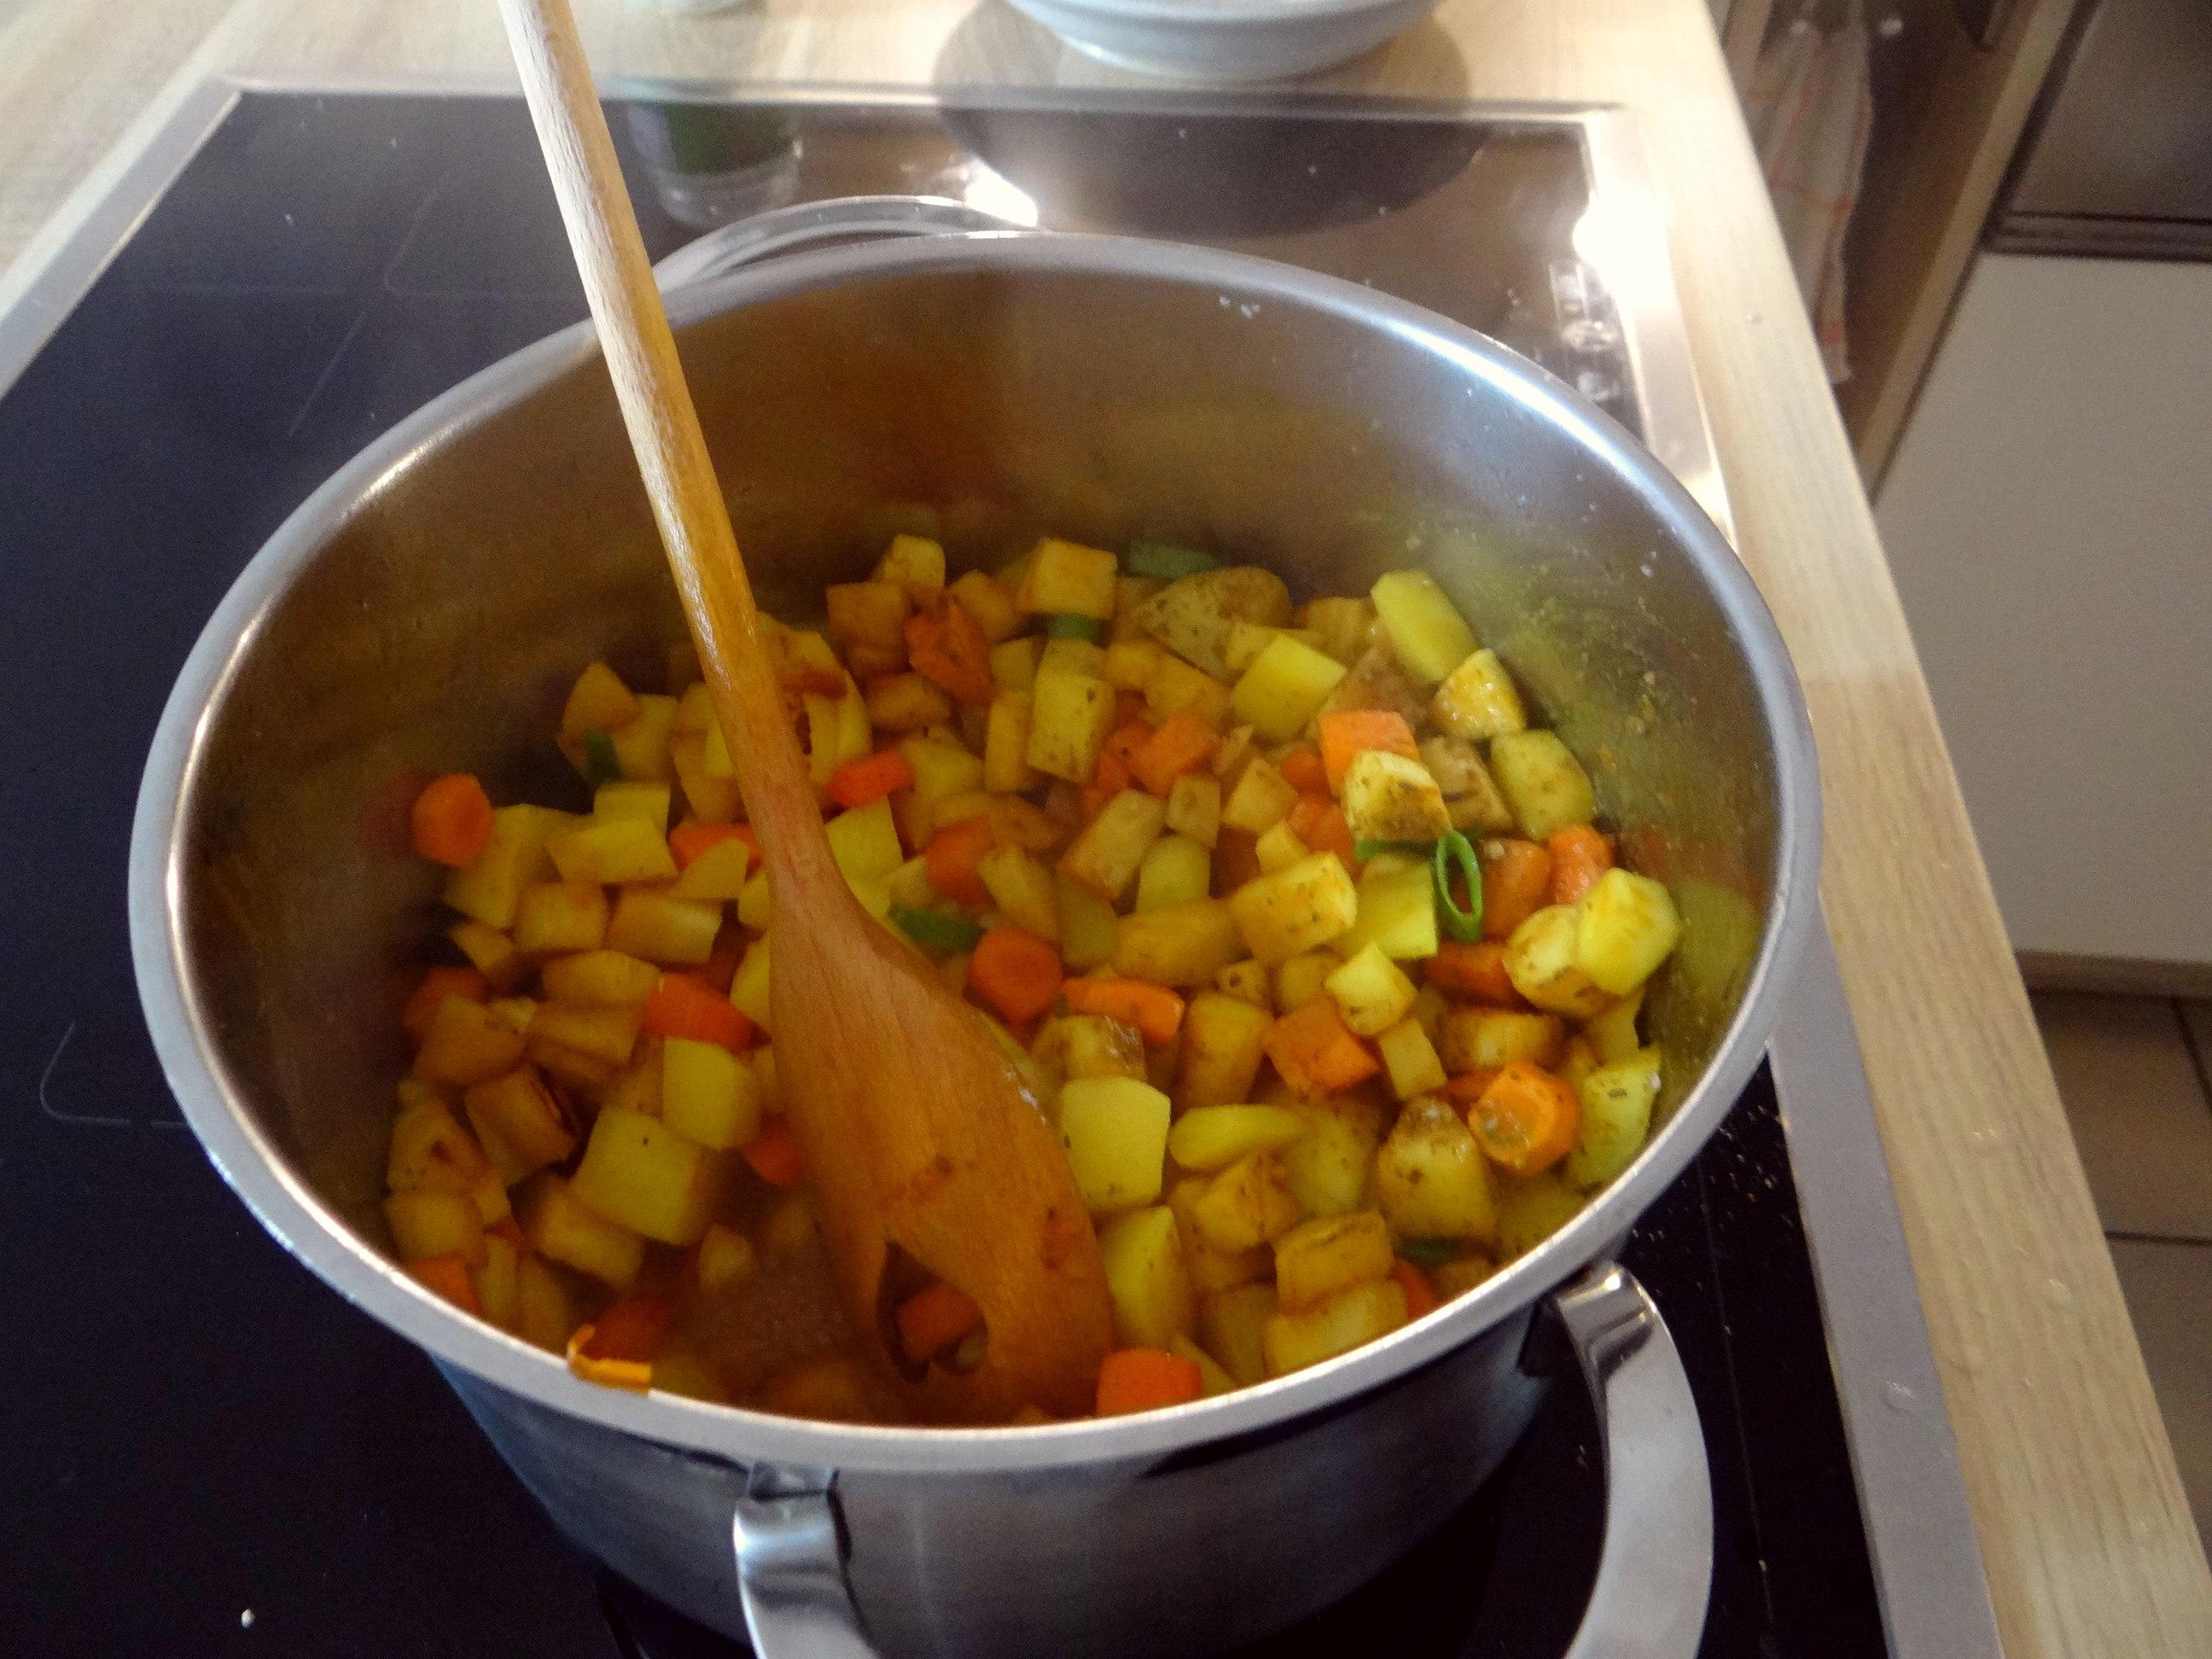 One Pot Pastinaken,Möhren,Kartoffeln (5)